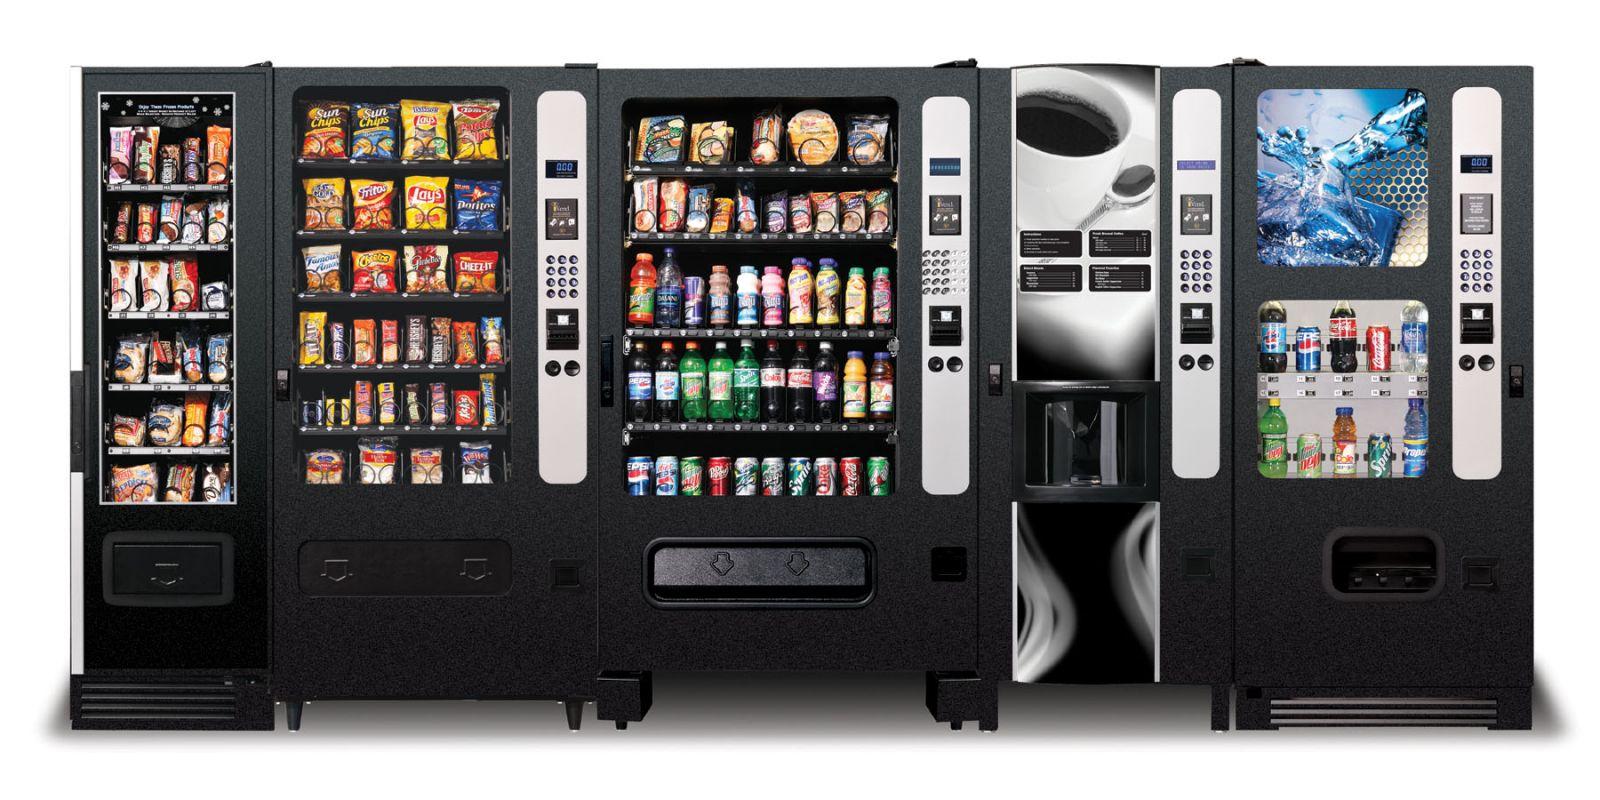 Office vending services